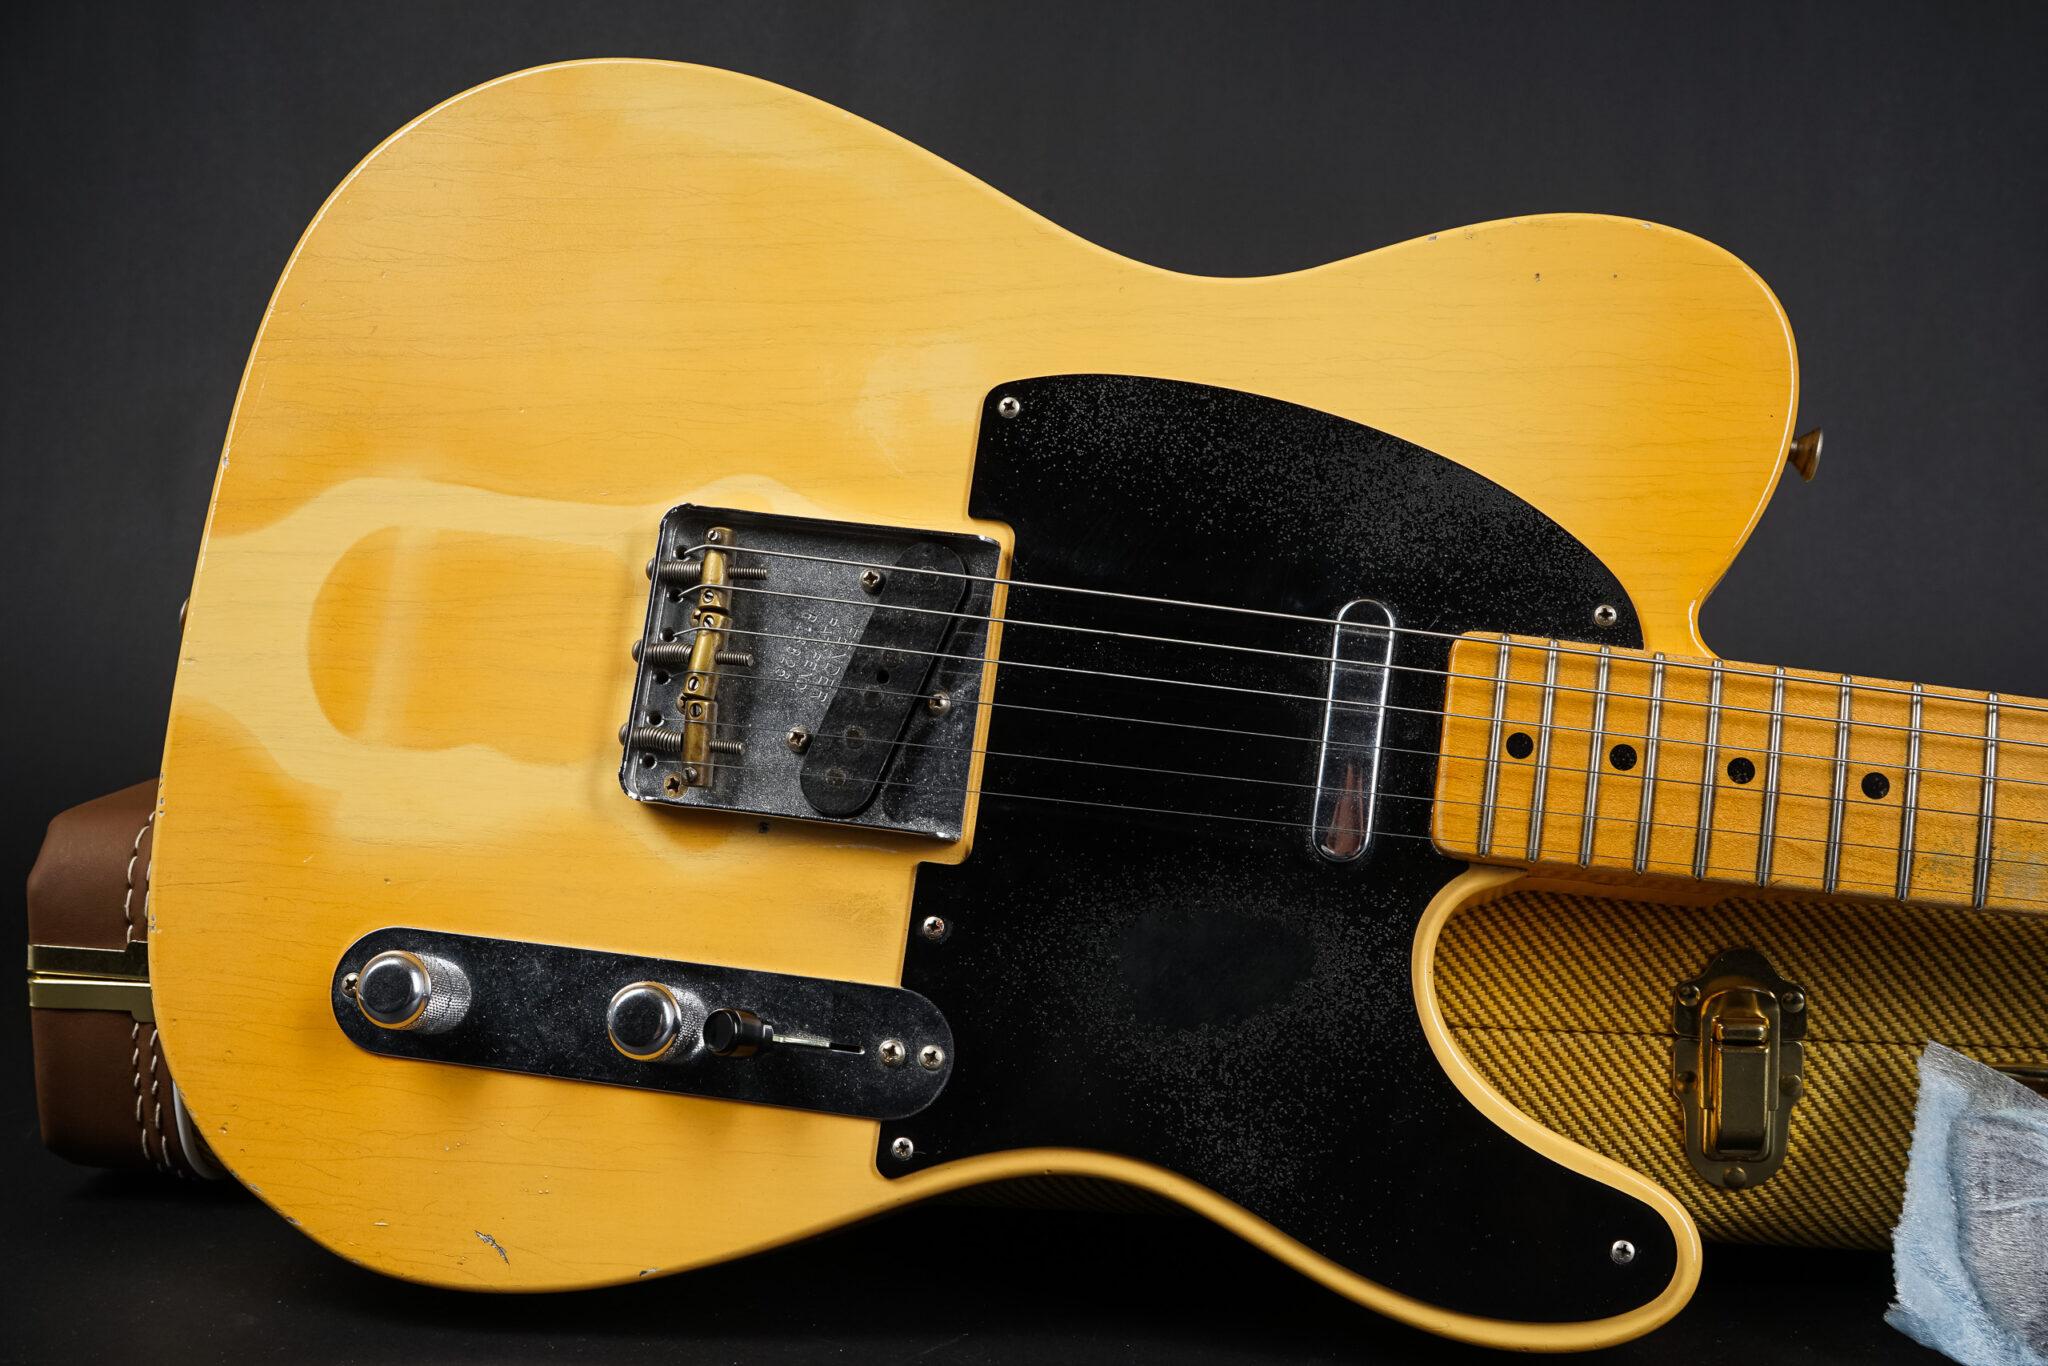 https://guitarpoint.de/app/uploads/products/2017-fender-paul-waller-masterbuilt-1953-tan-line-telecaster-heavy-relic-blonde/2017-Fender-Masterbuilt-Paul-Waller-Tanline-Tele-8-2048x1366.jpg